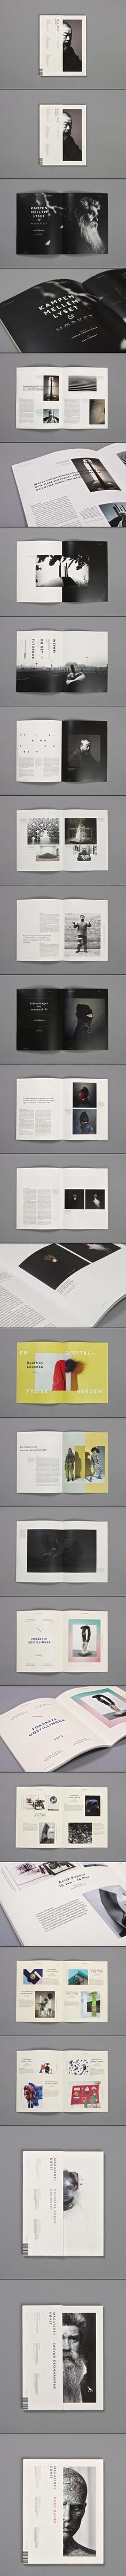 http://www.behance.net/gallery/Experimental-Brochure-El-infinito-ahora/10046257